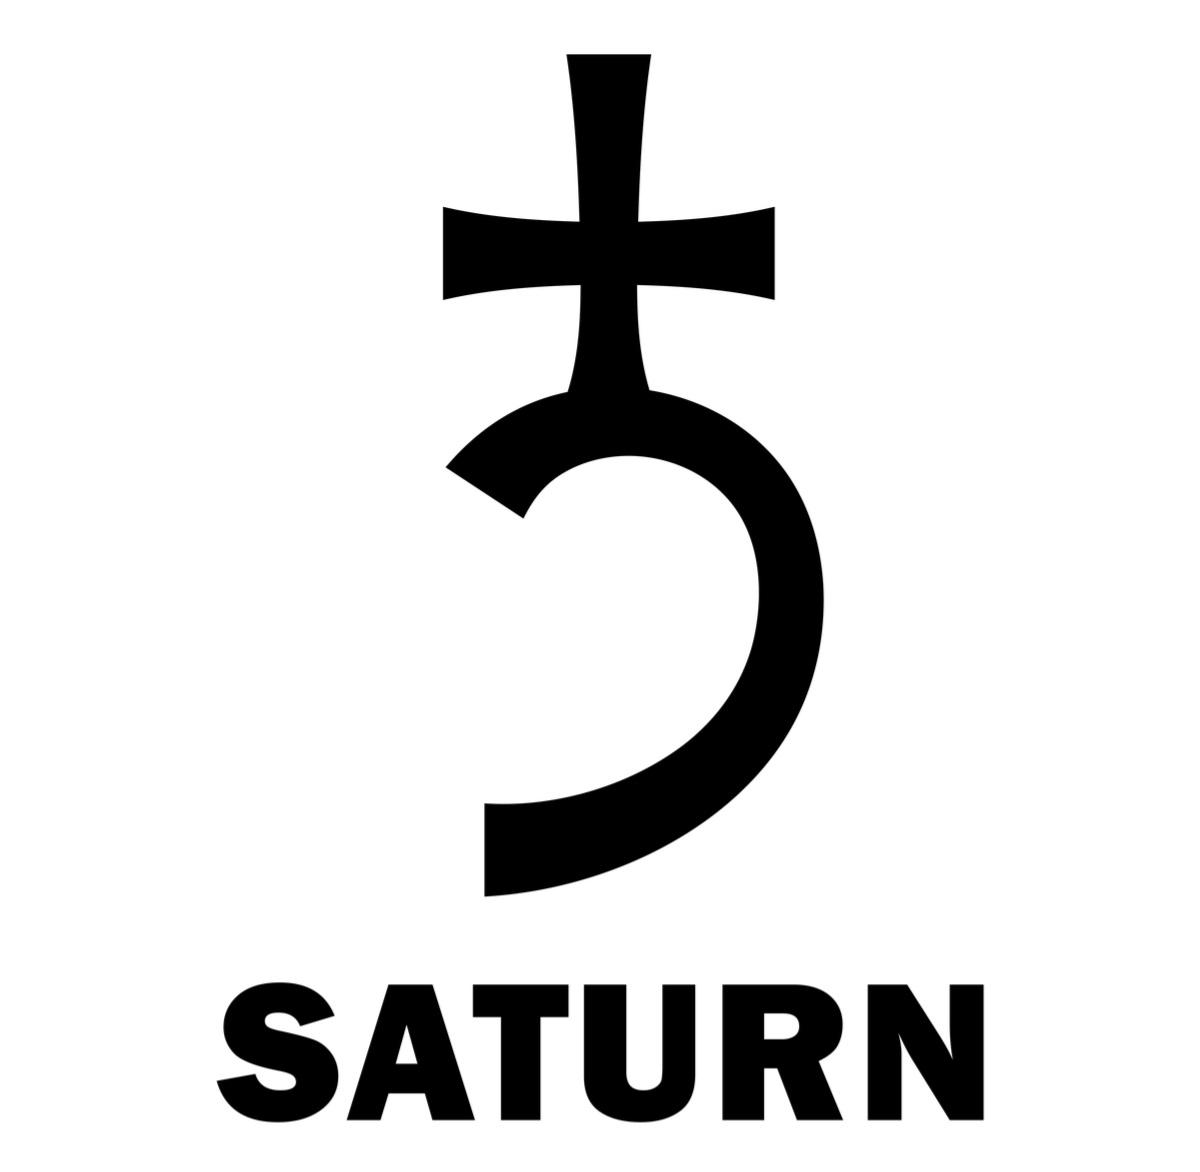 saturn-symbol.jpg